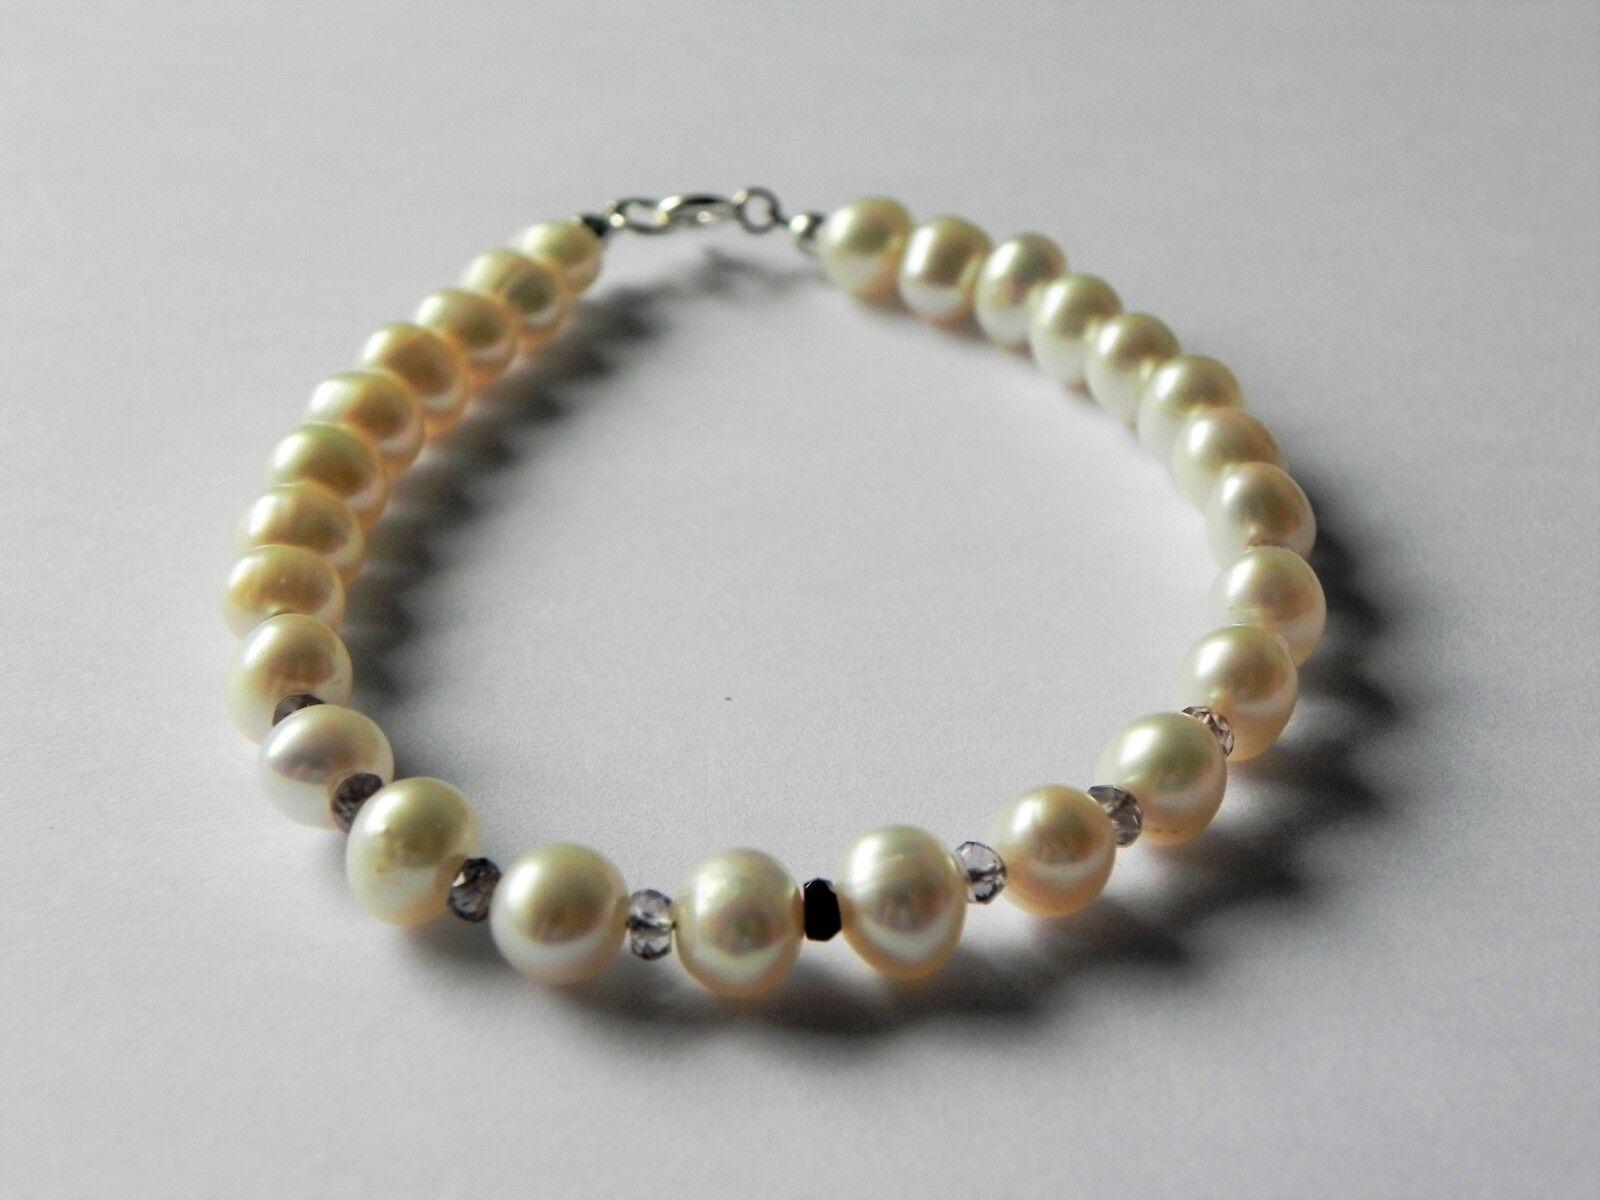 Freshwater pearl and spinel gemstone bracelet